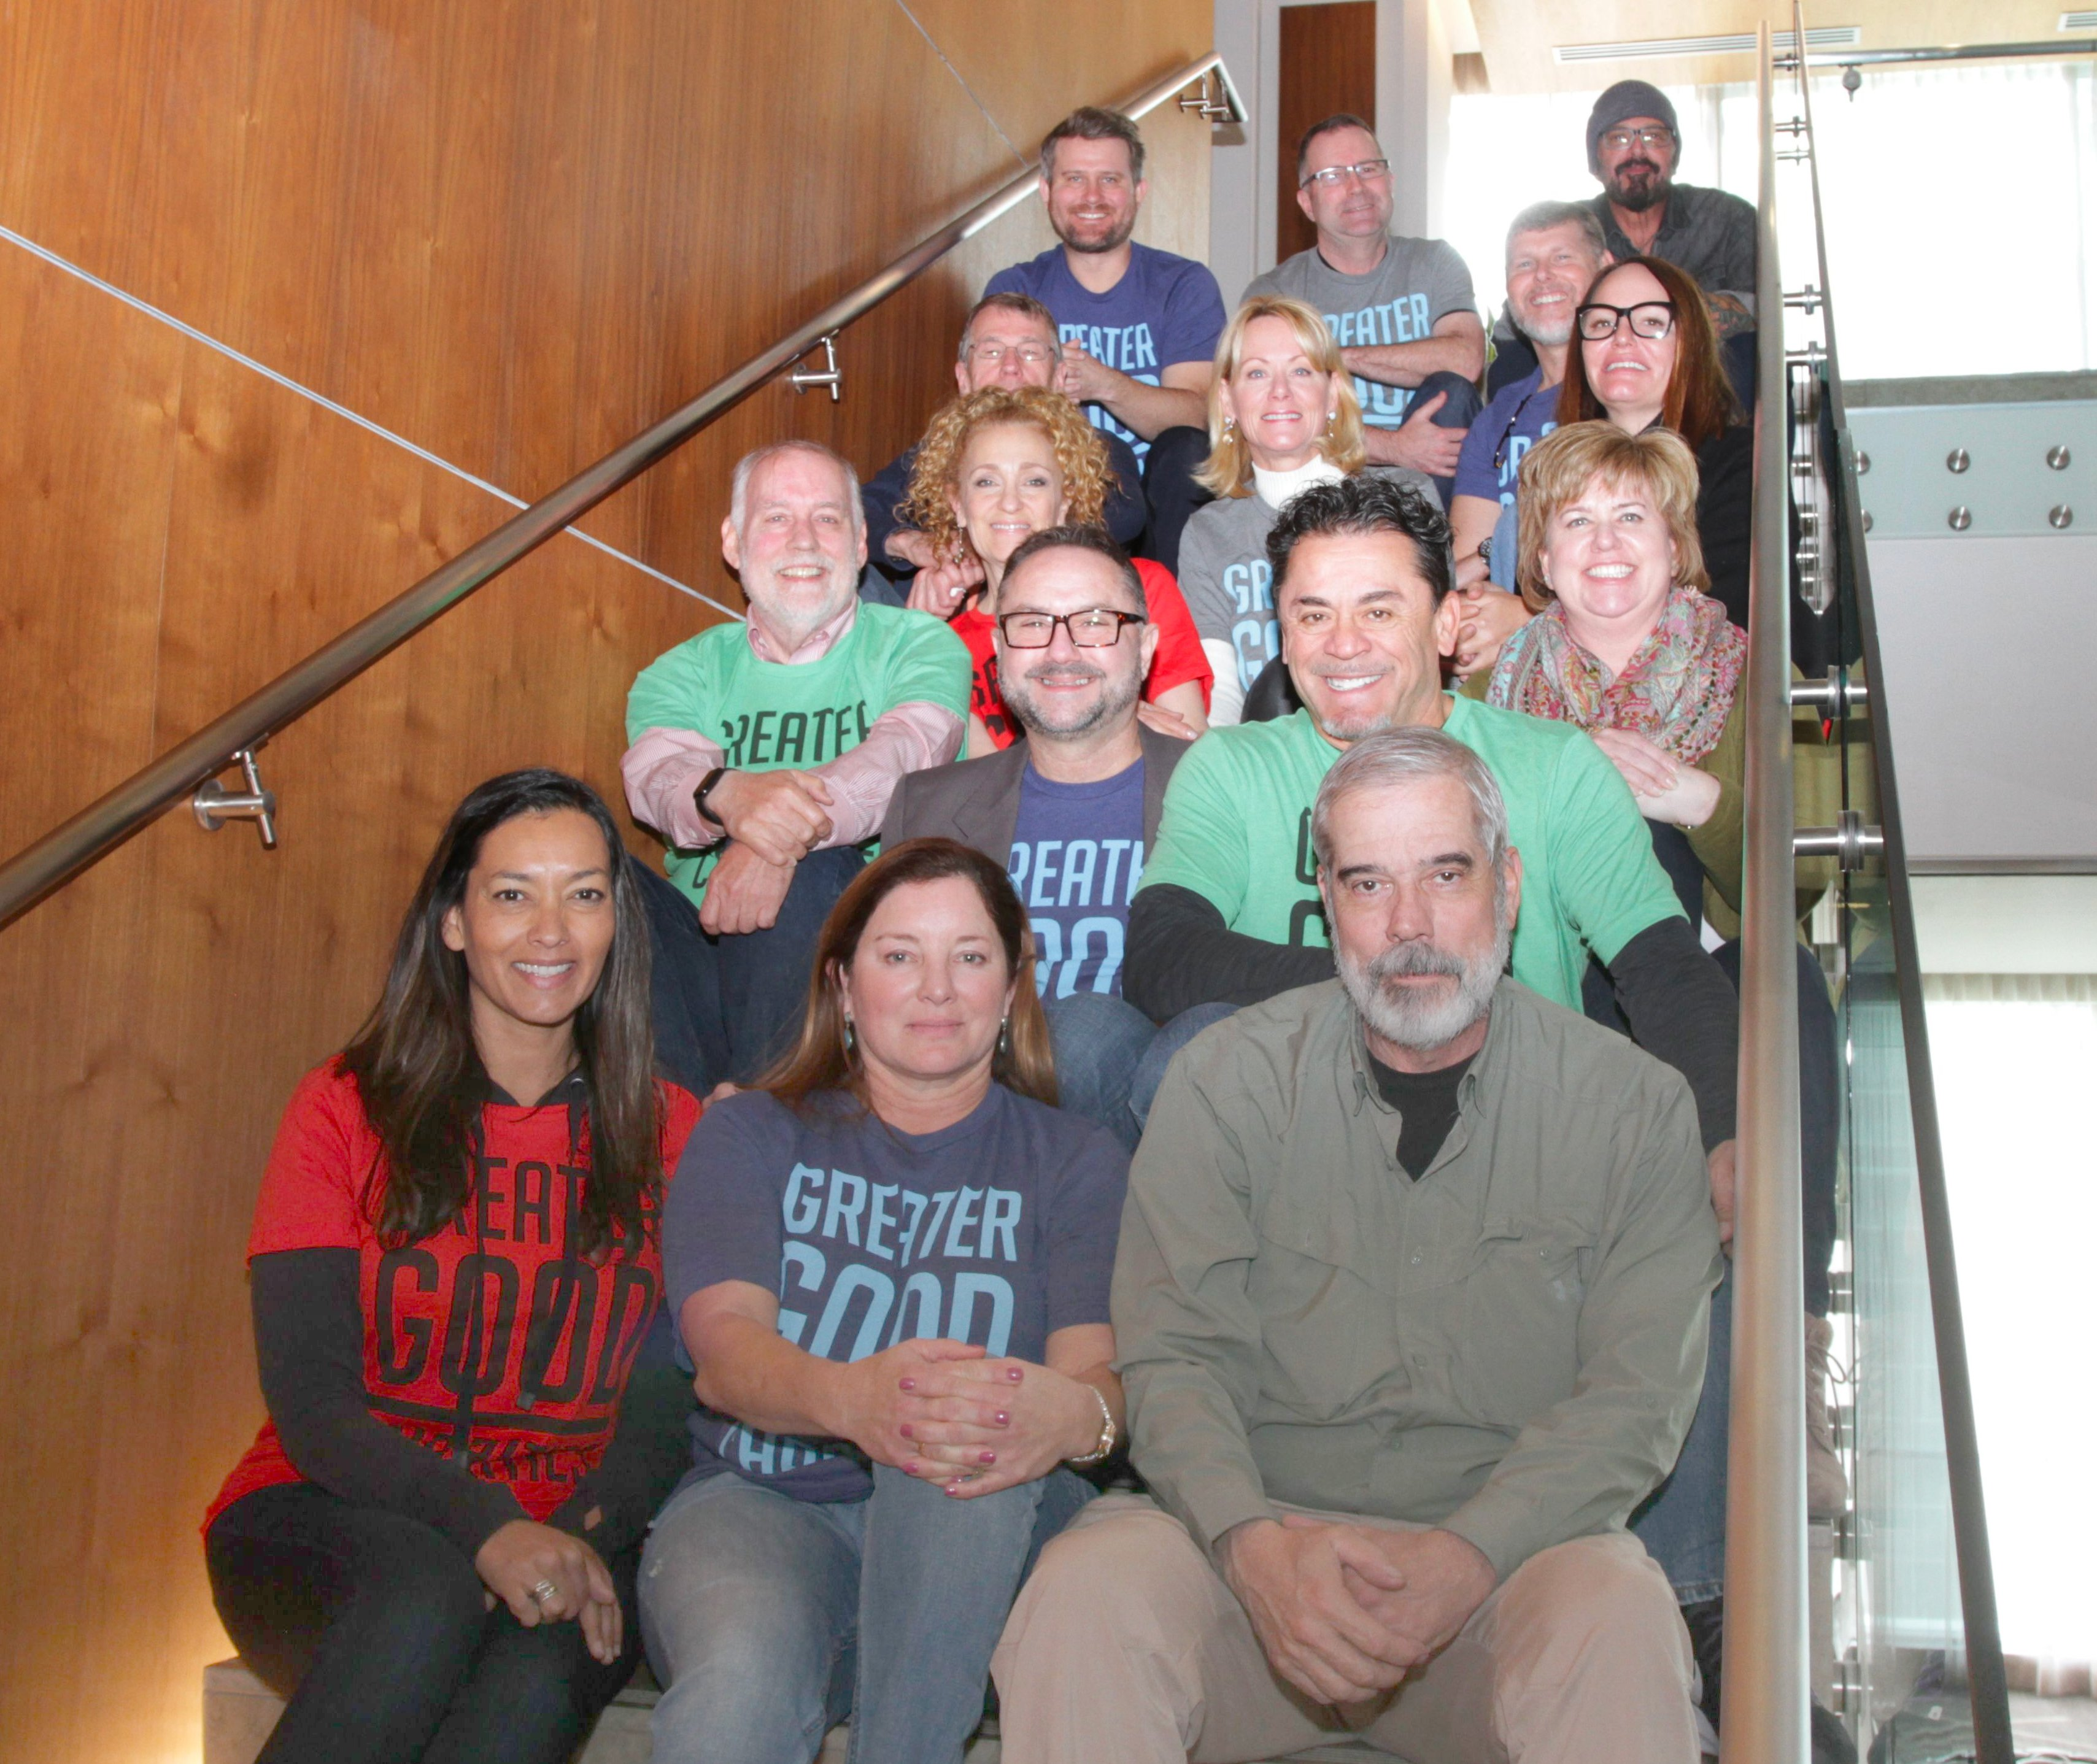 board-members-group-on-stairs